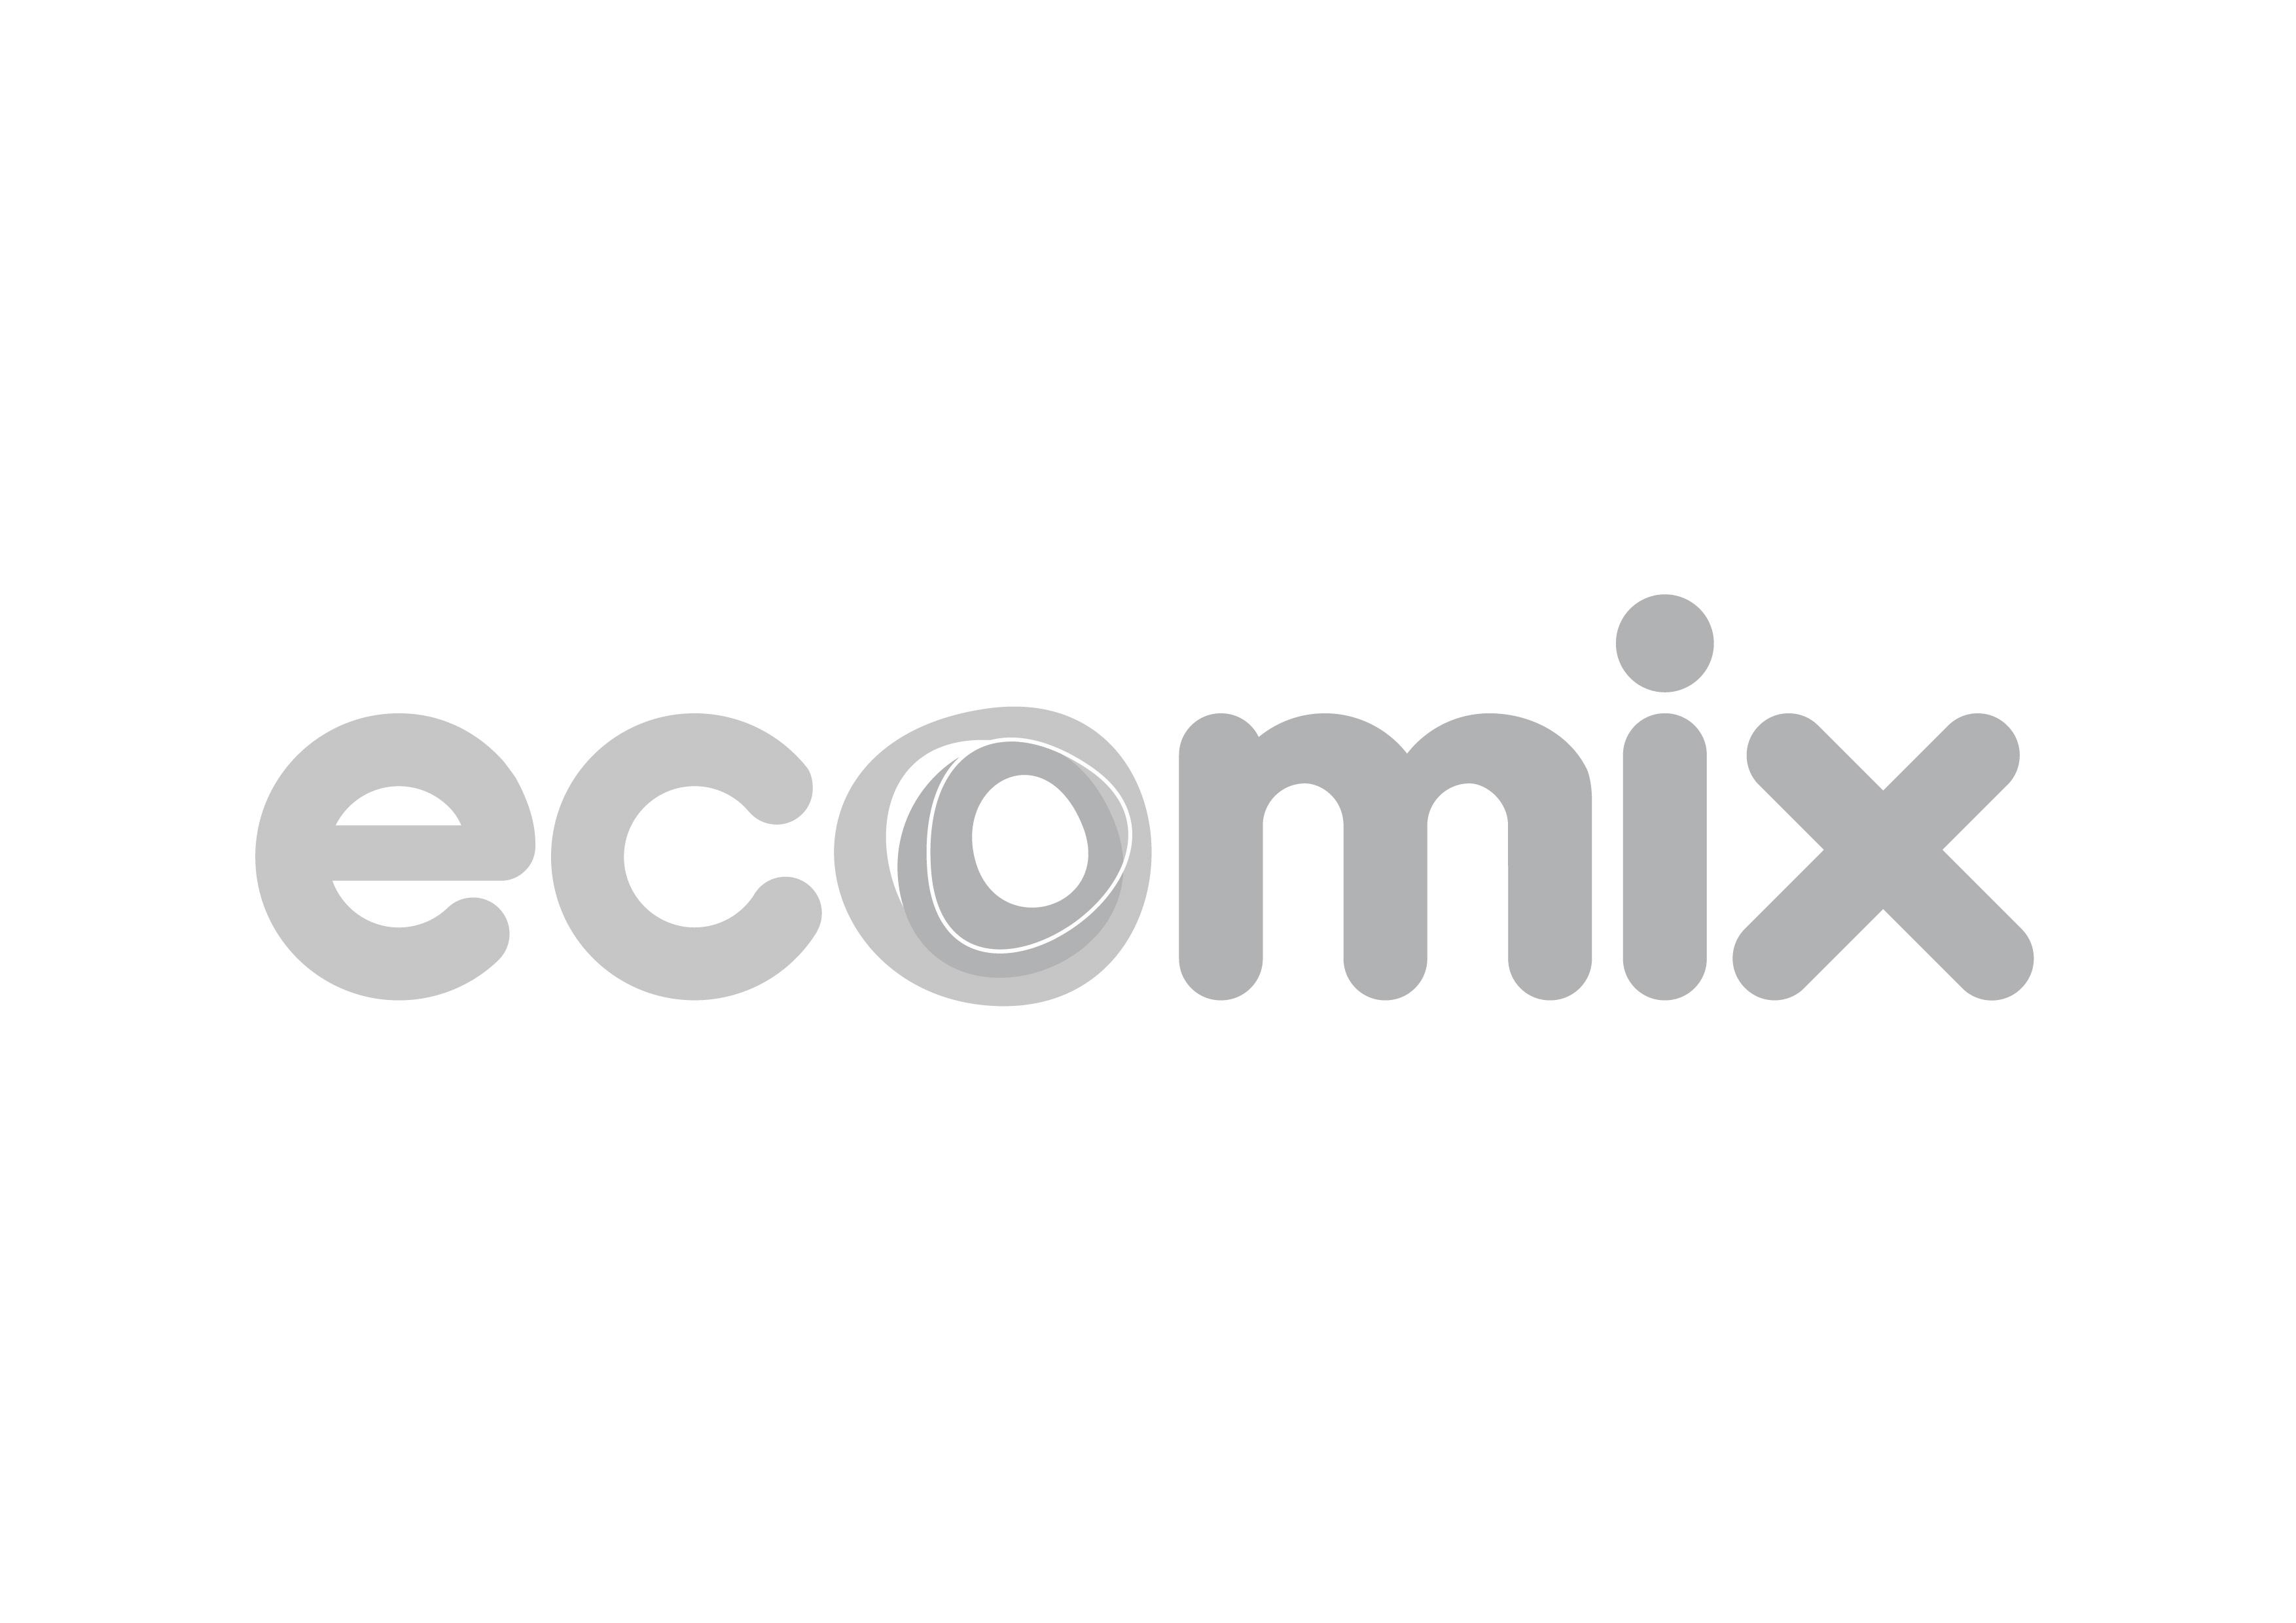 Ecomix_Logo_End